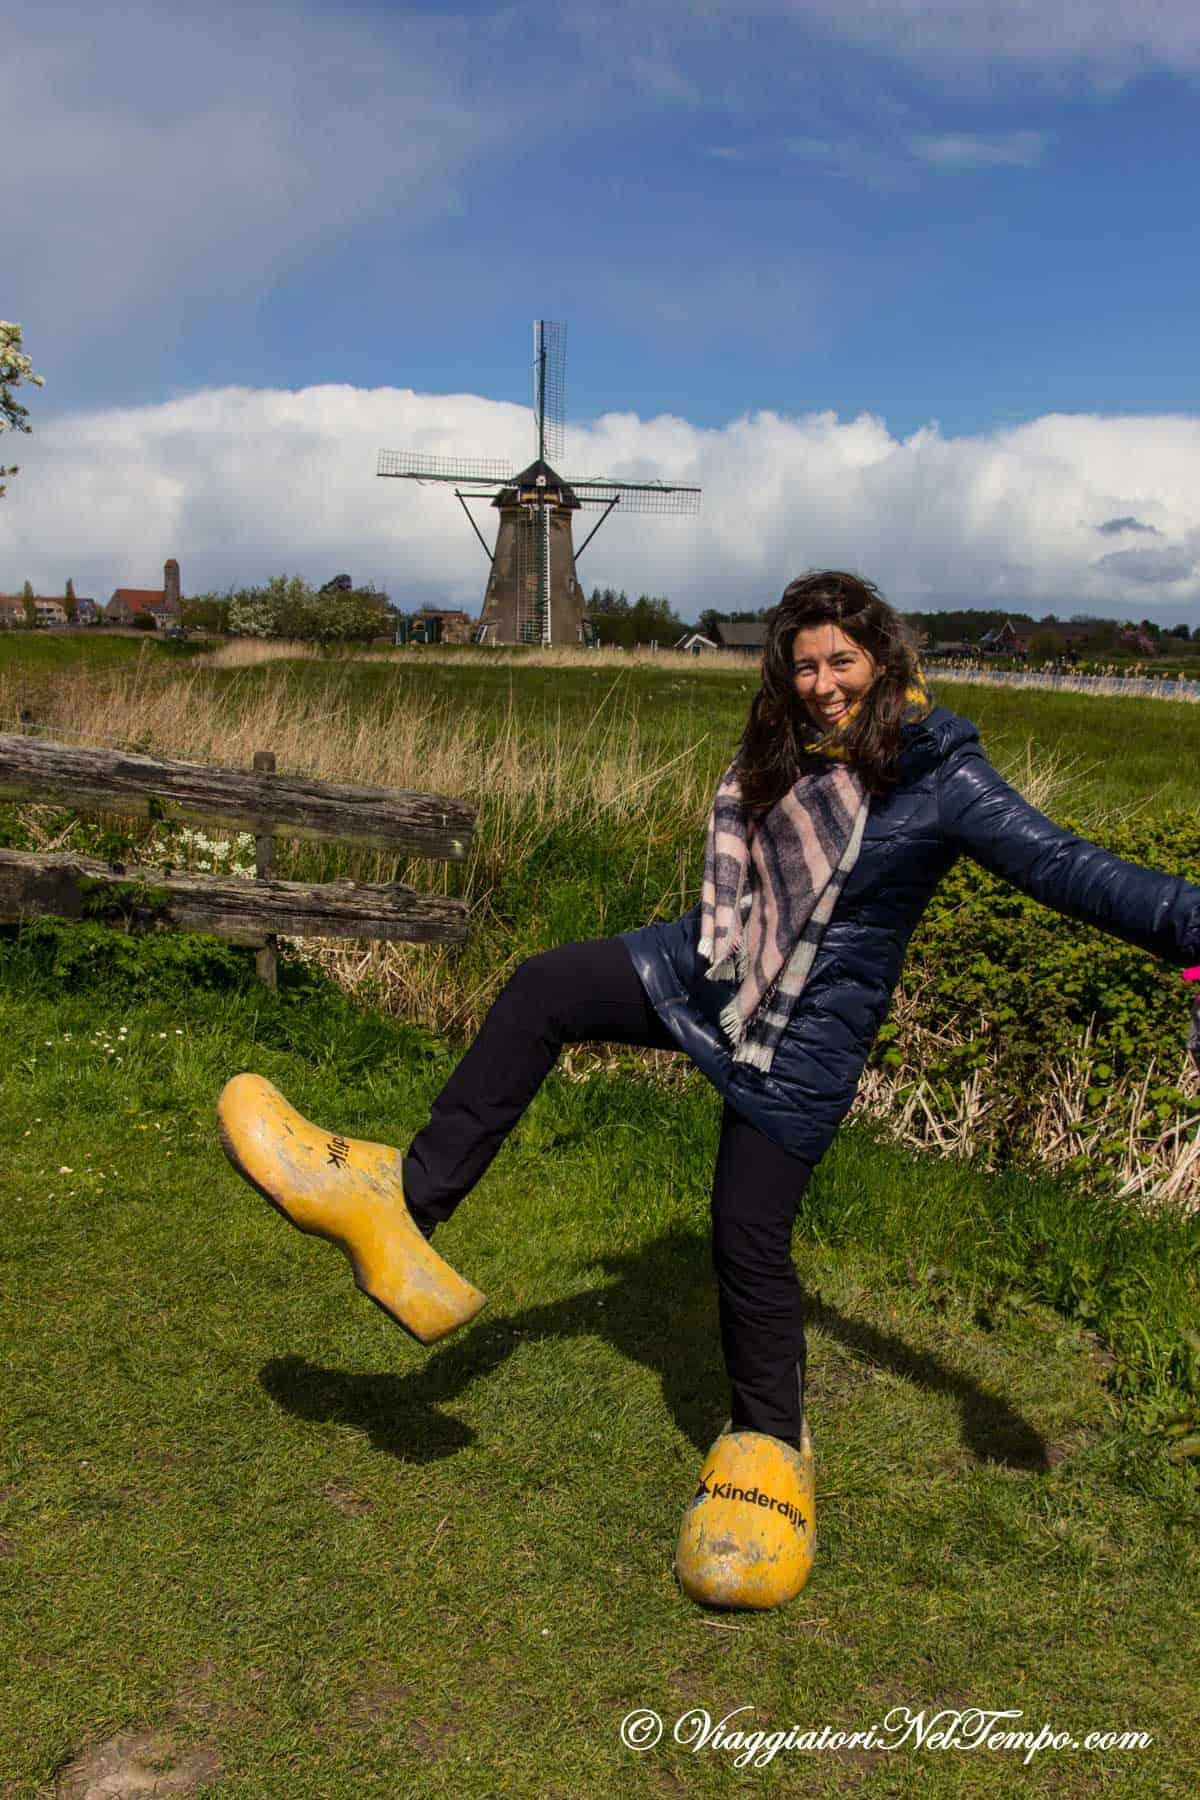 Olanda - tour di 4 giorni tra tulipani e mulini